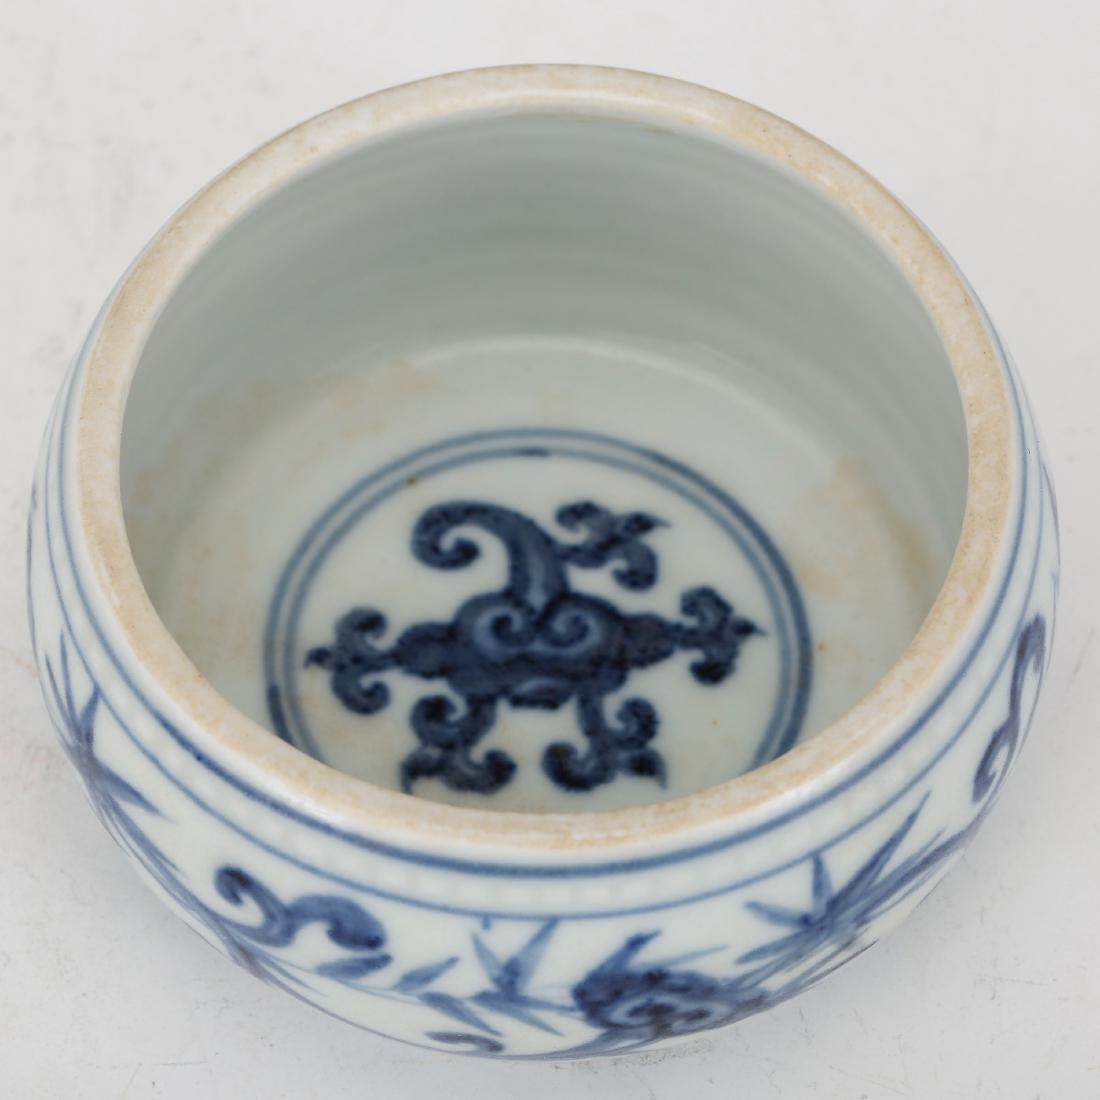 CHINESE BLUE AND WHITE PORCELAIN BRUSH WASHER